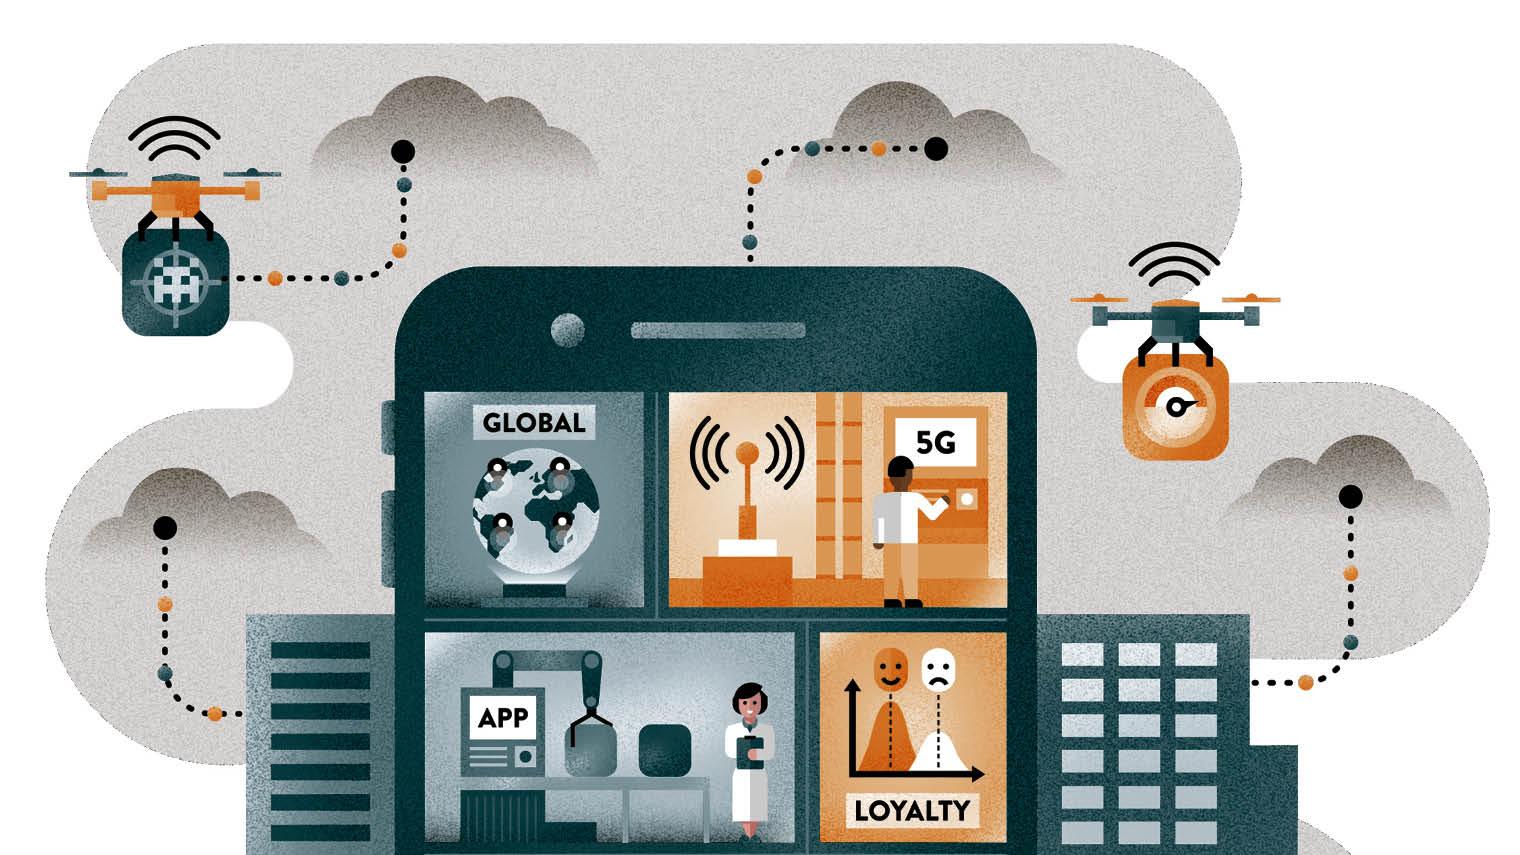 Illustration of mobile use